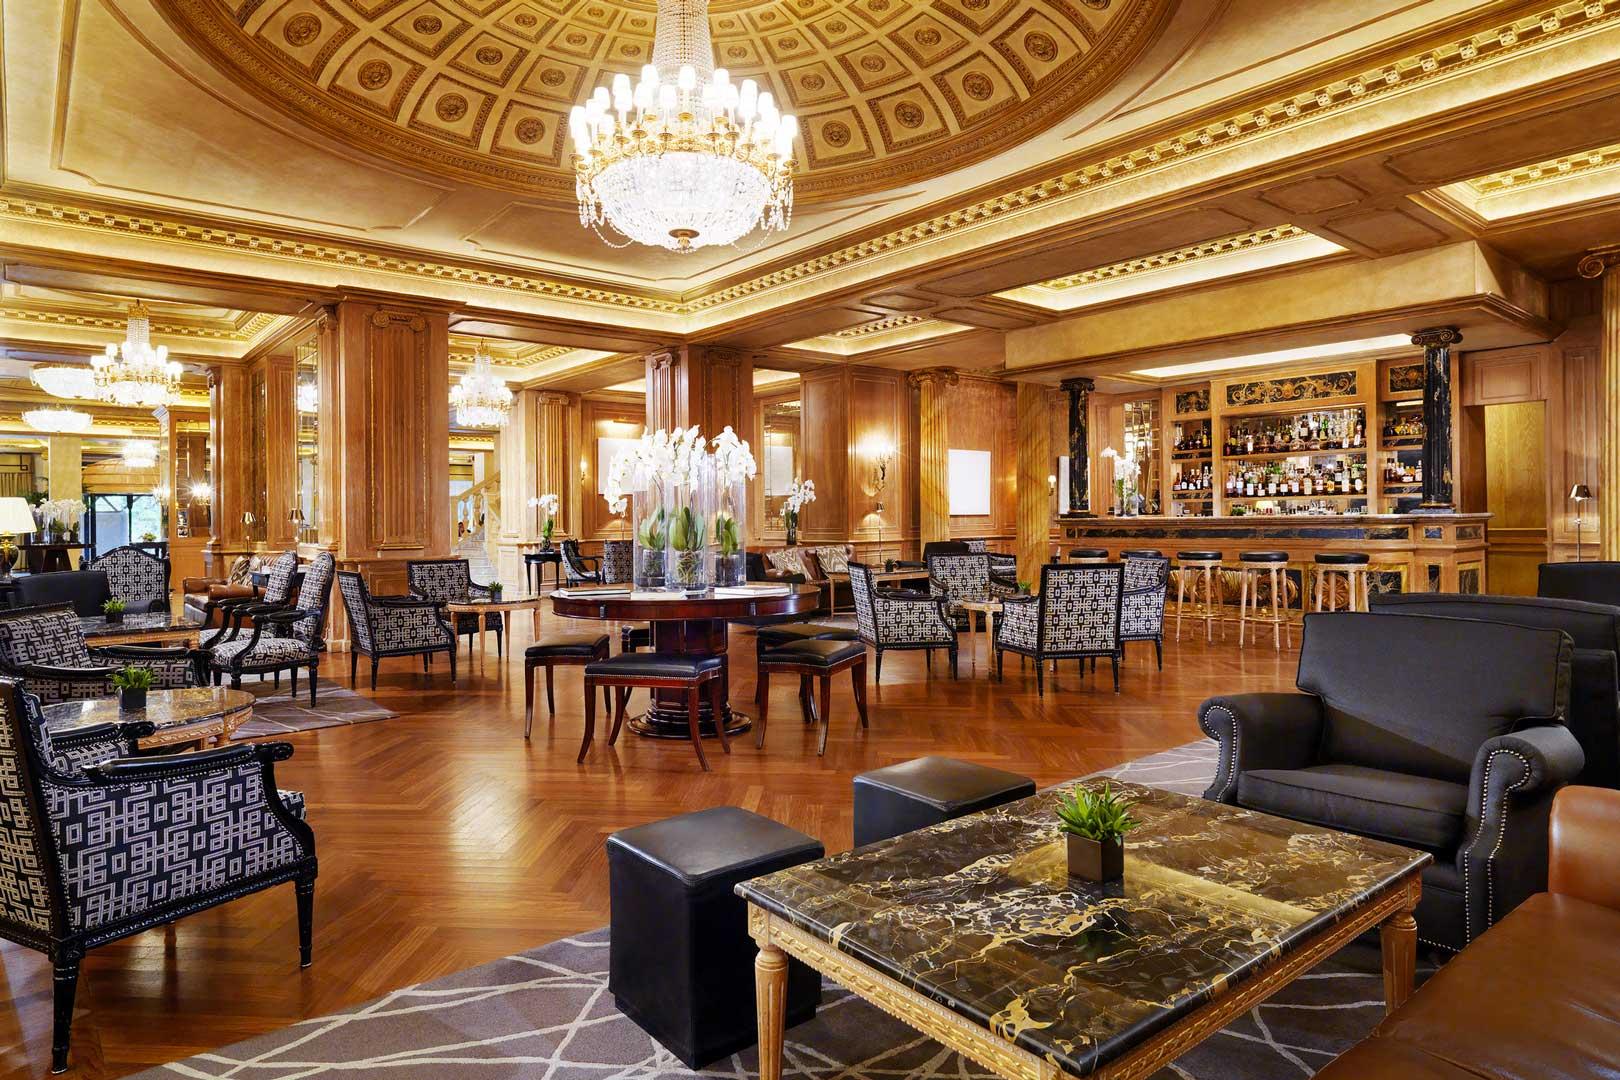 Westin Palace Milan - The Lounge Bar